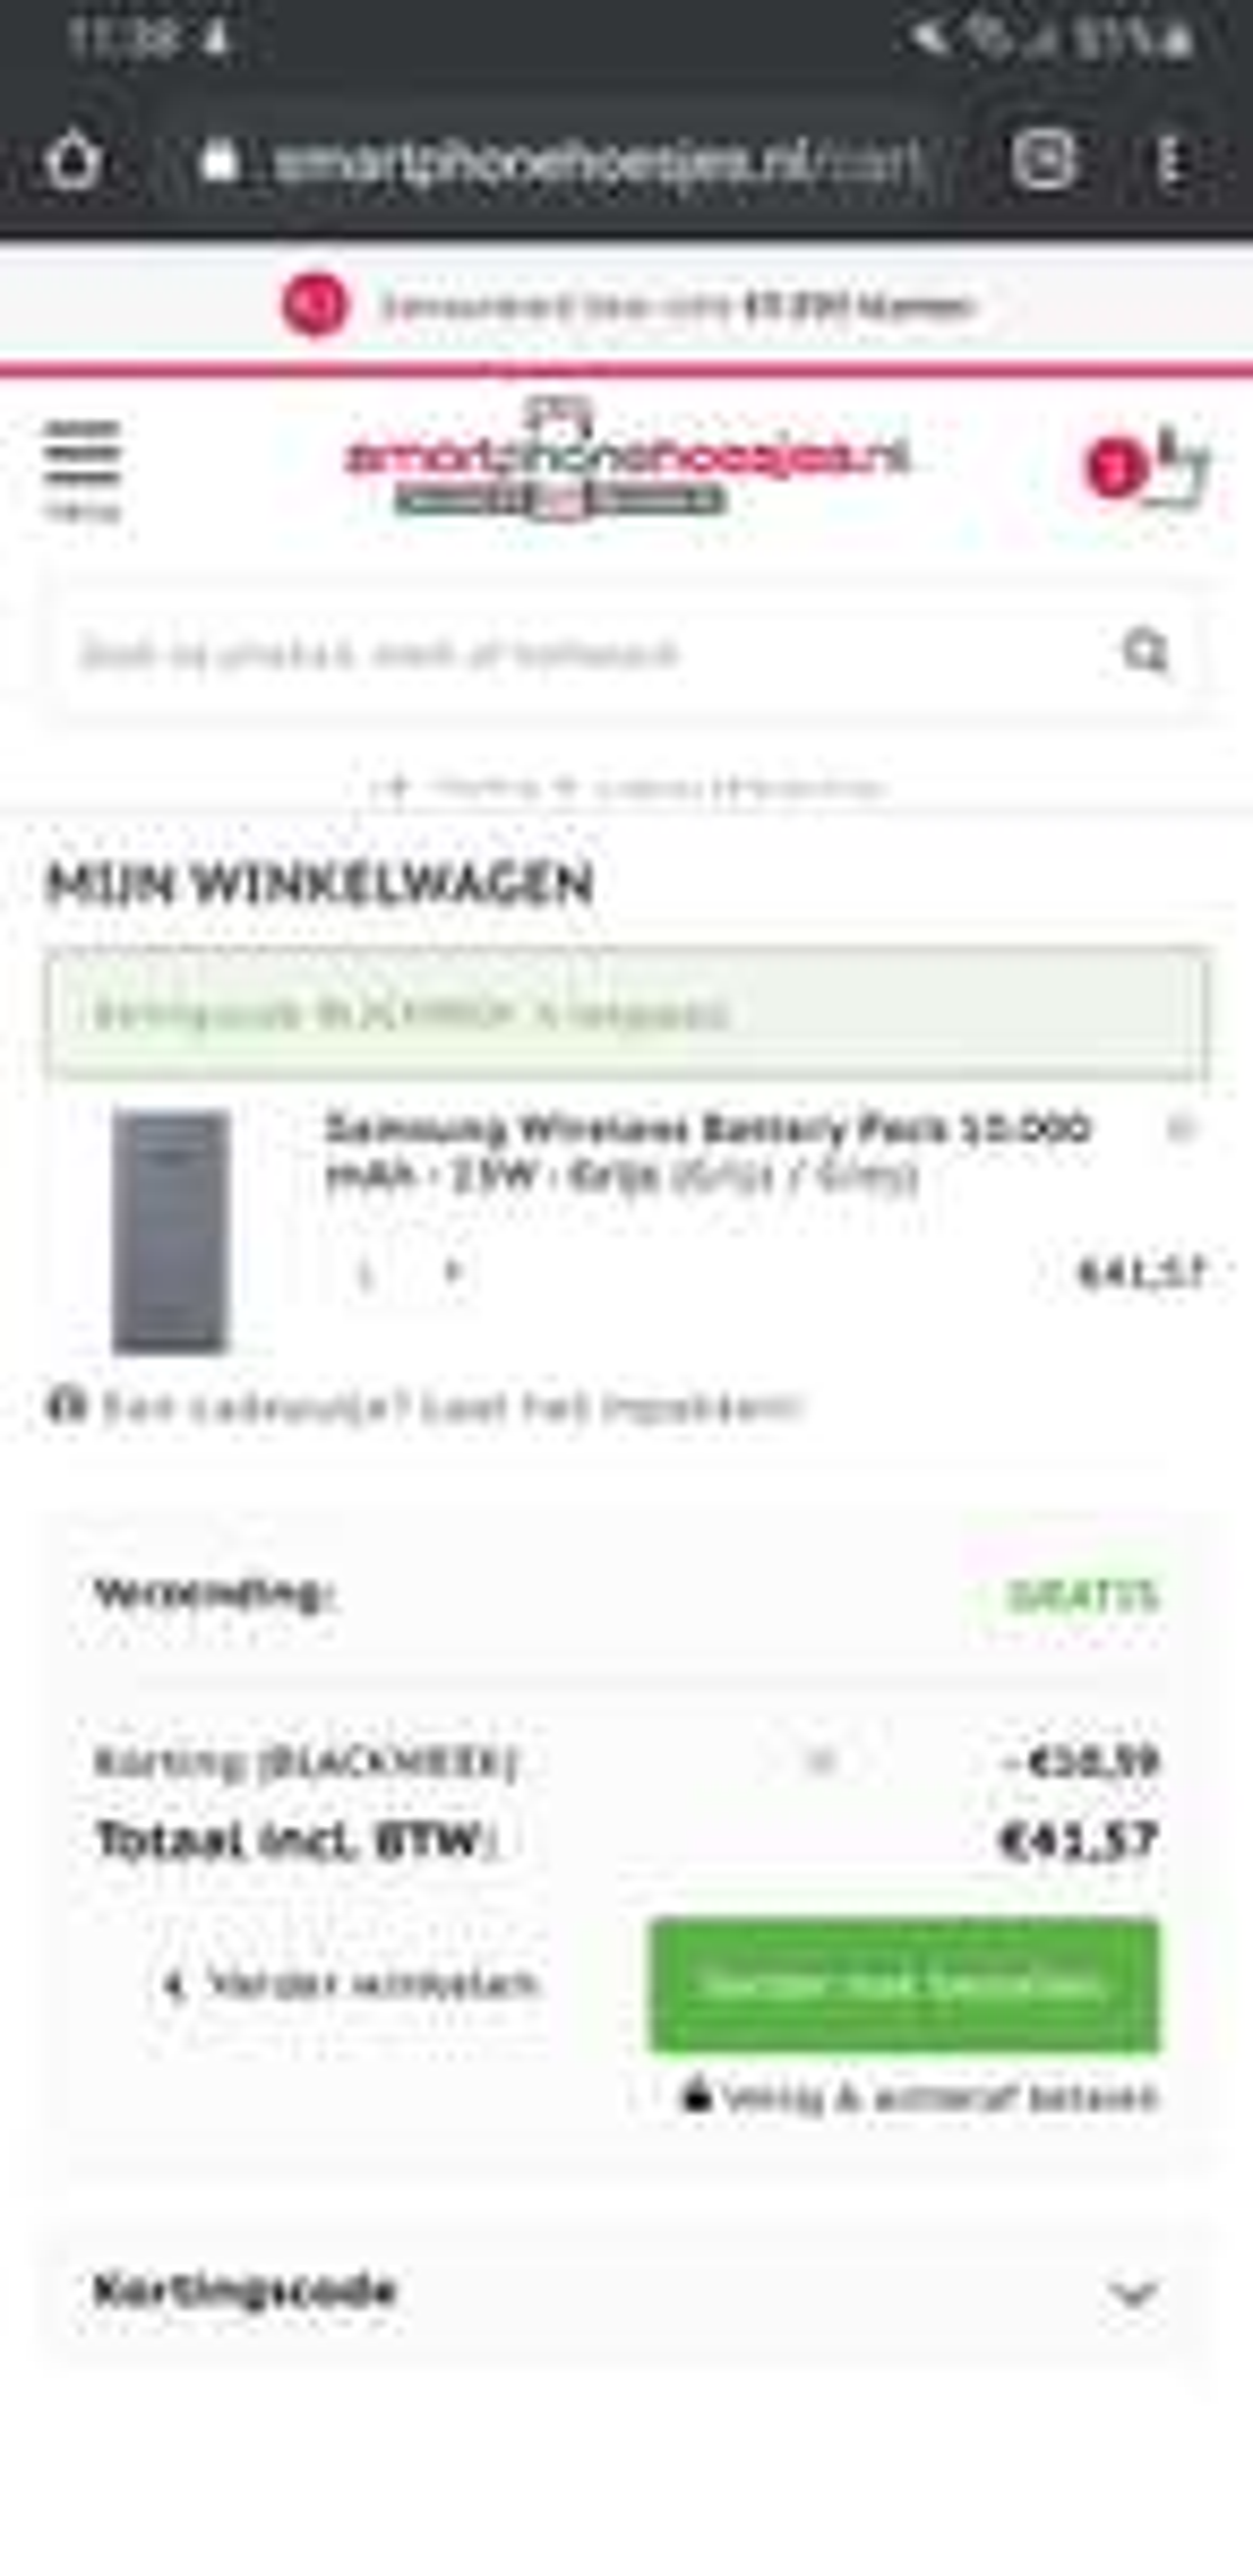 Samsung Wireless Battery Pack 10.000 mAh - 25W - Grijs